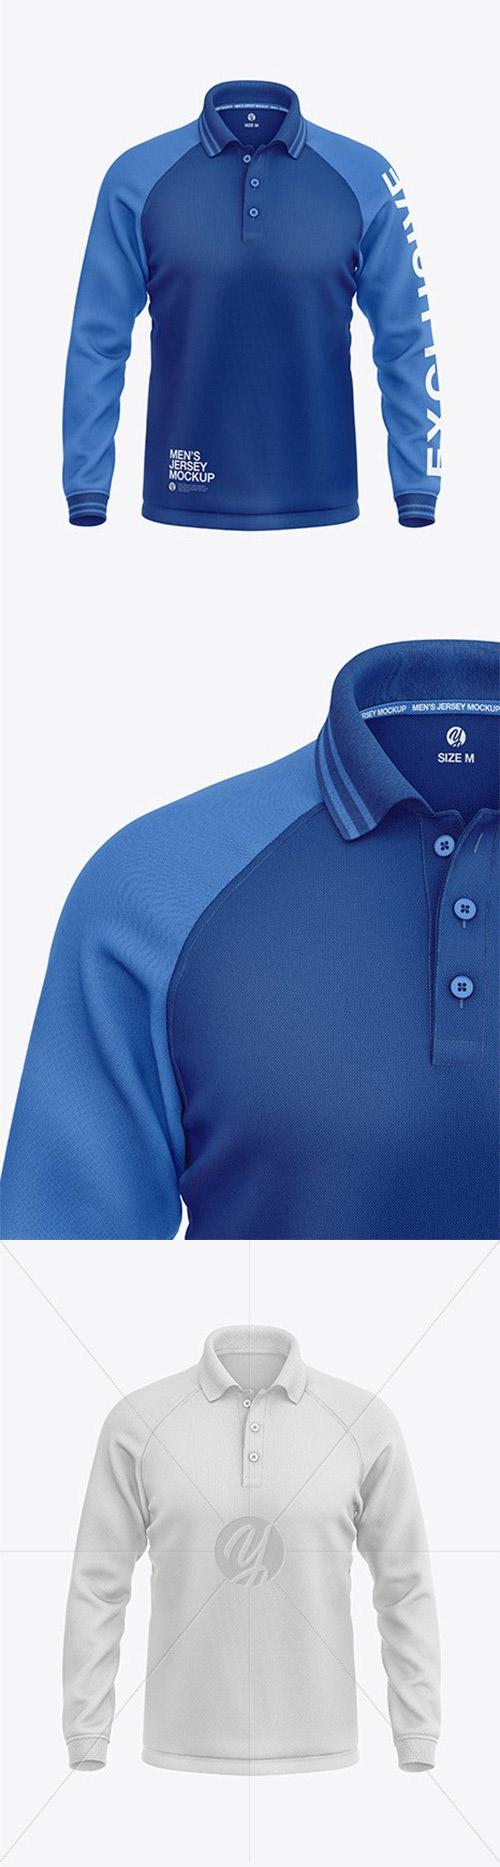 Download Pin By Sina Savad On Free Mockup Long Sleeve Polo Mens Long Sleeve Sleeves